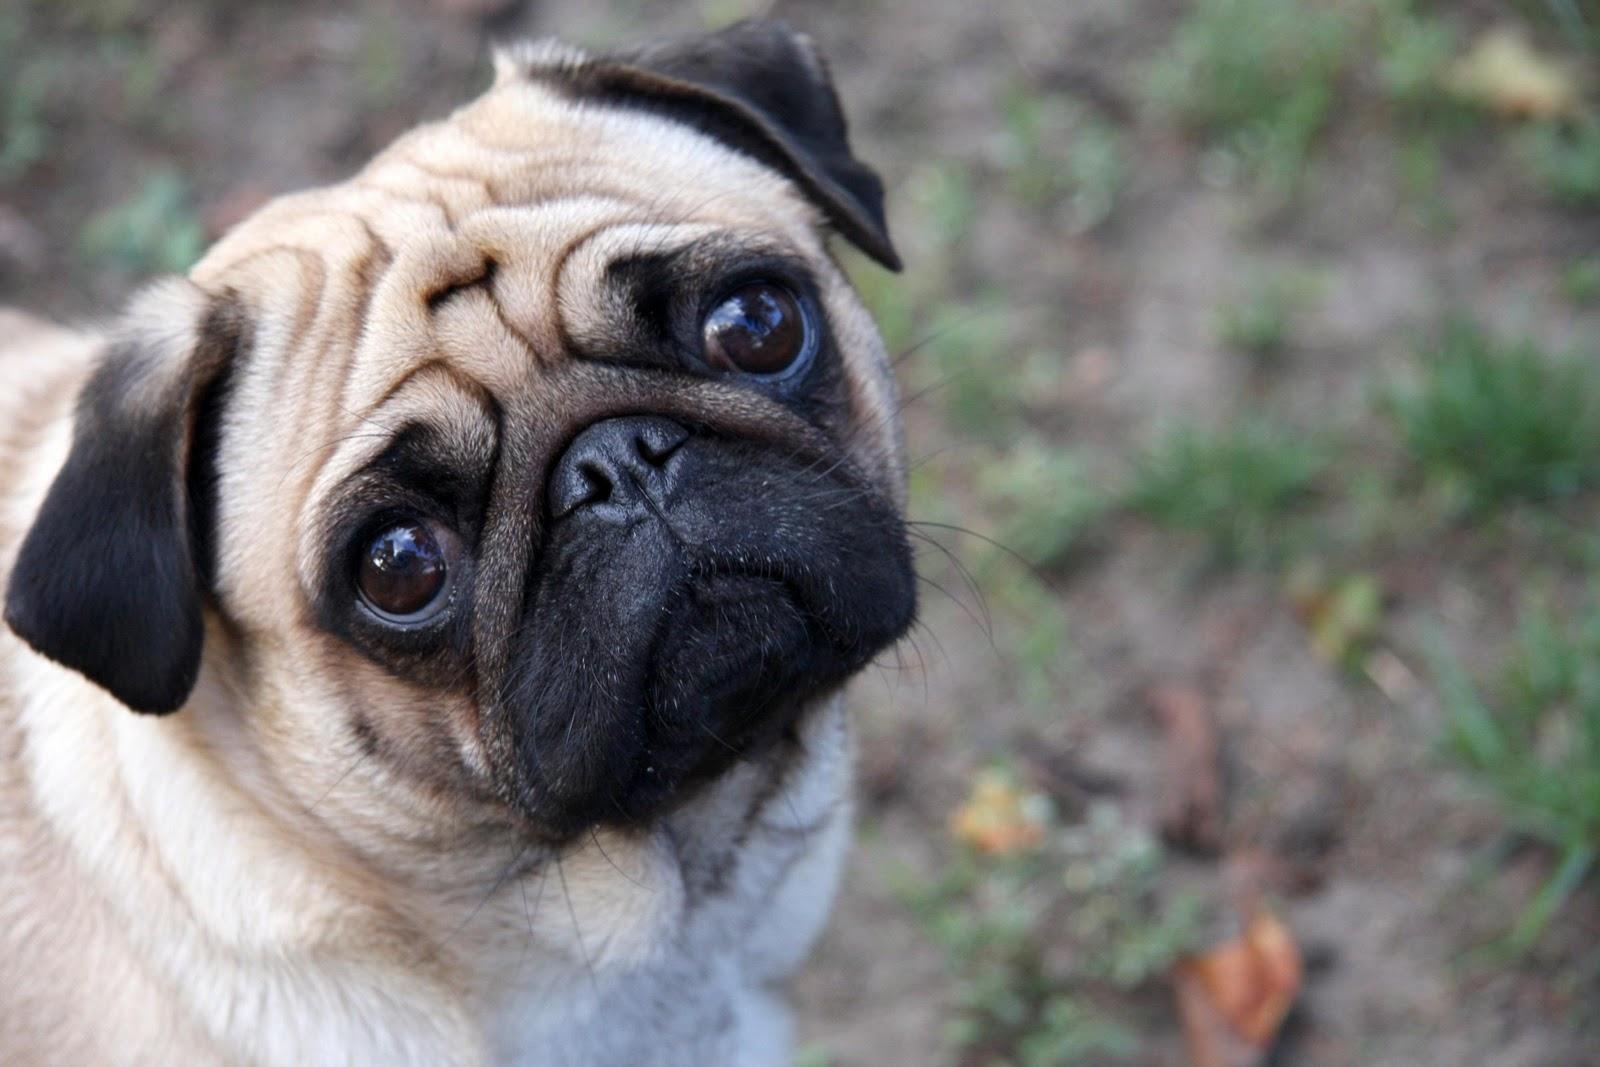 http://1.bp.blogspot.com/_yUH2SOtGH0k/TMb7wl2wM1I/AAAAAAAAVrU/ayw95noQ1dA/s1600/doggie-sad-pug-wallpaper-HD.jpg